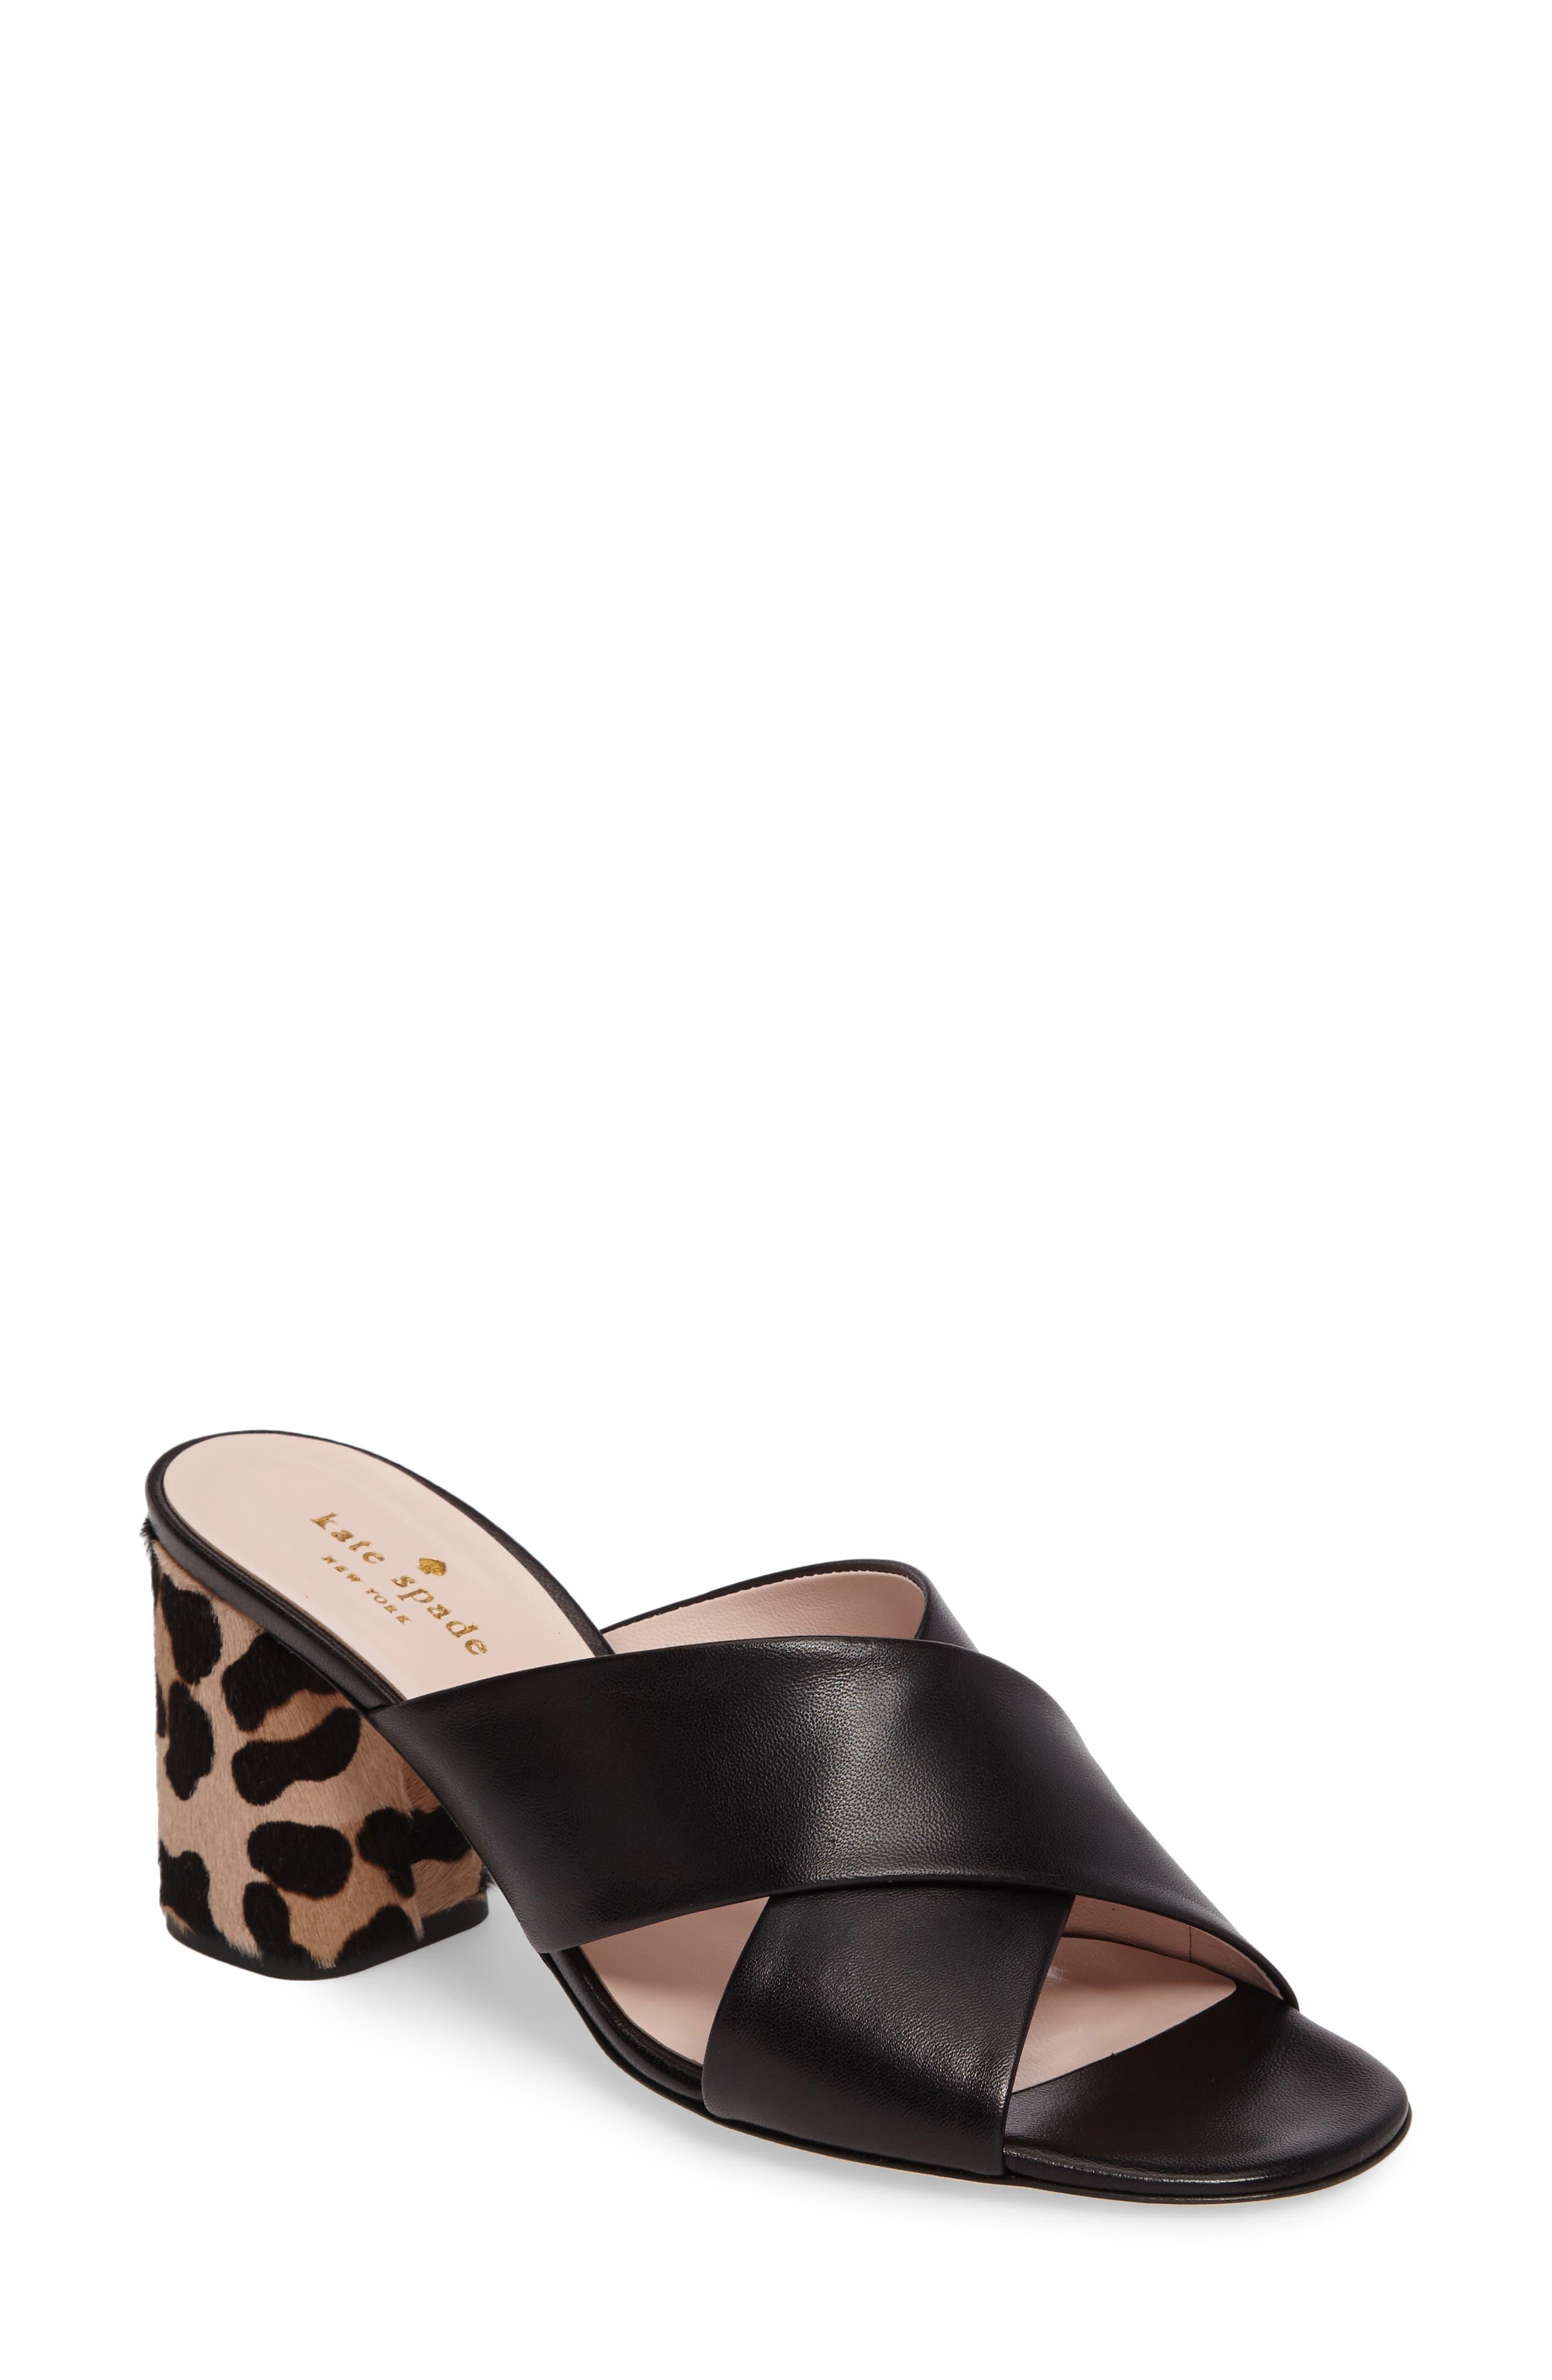 denault slide sandal,                             Main thumbnail 1, color,                             001